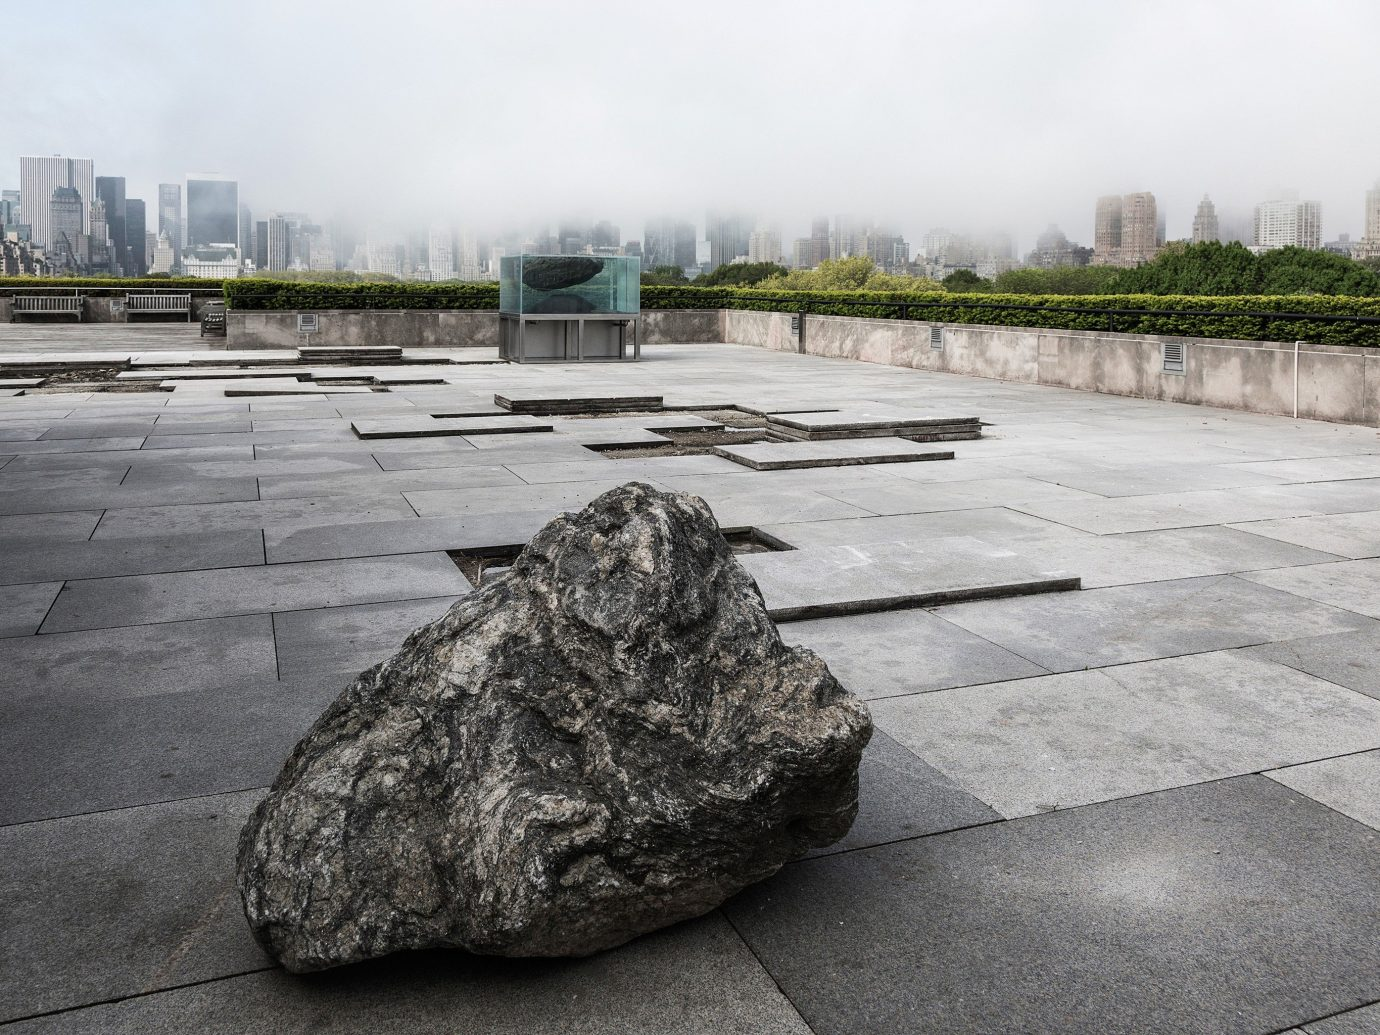 Arts + Culture ground outdoor rock way road surface sculpture sidewalk memorial monument material concrete cement paving